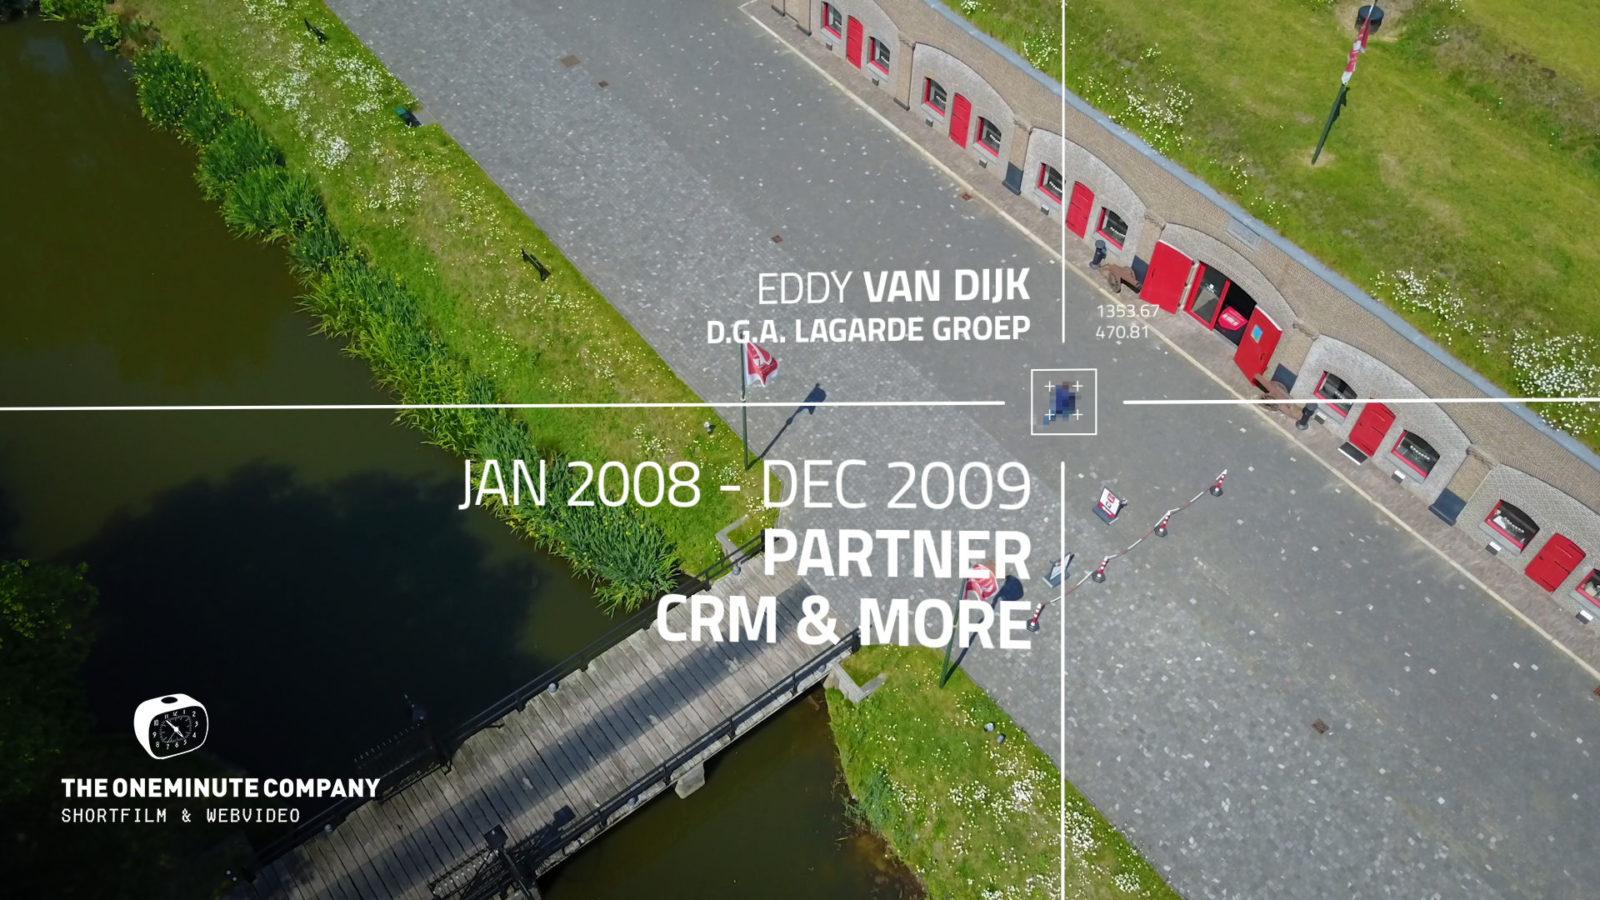 Event Sprekerintro Eddy van Dijkk